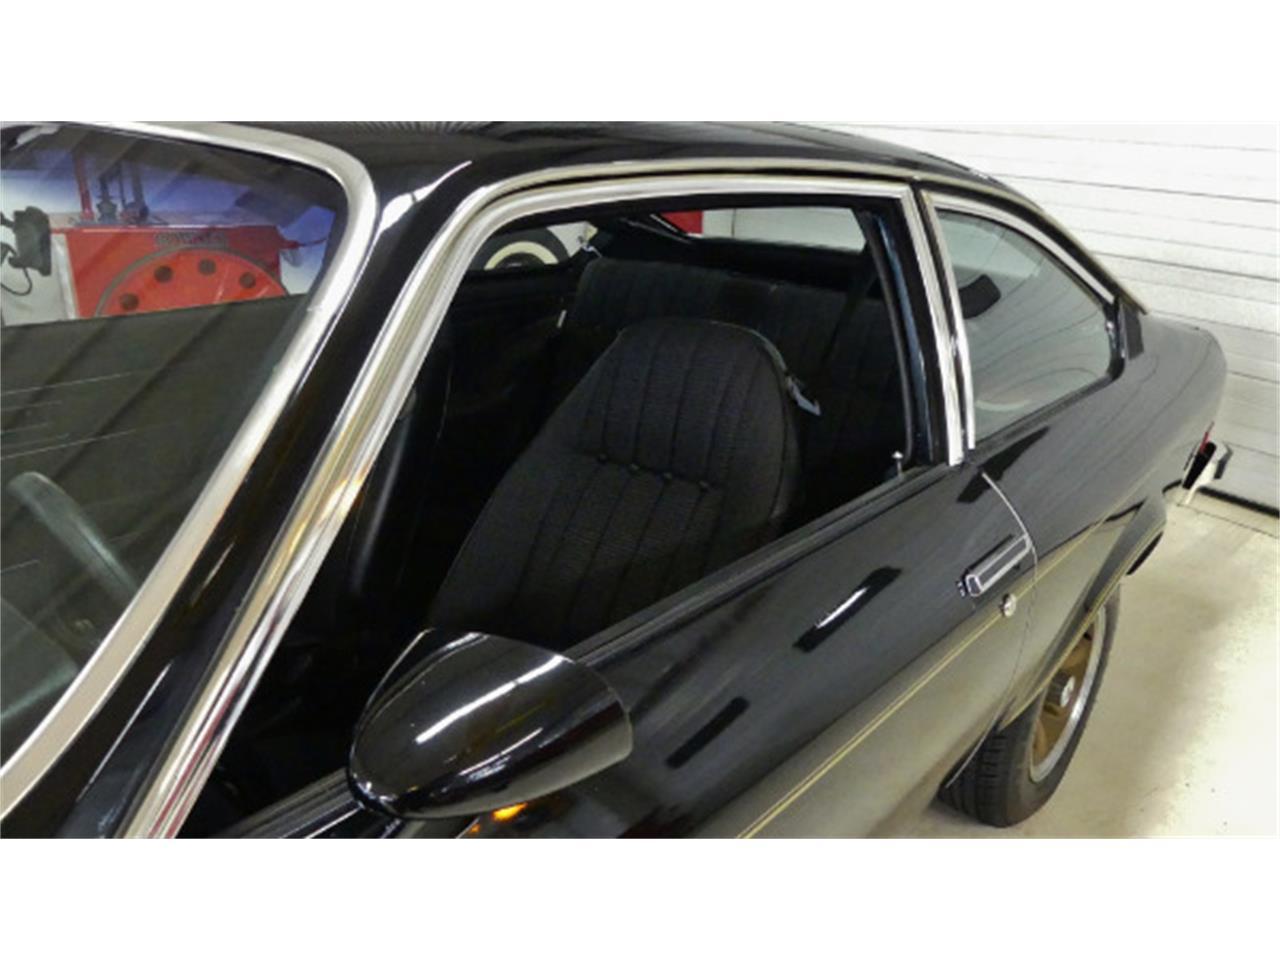 Large Picture of '75 Vega located in Columbus Ohio - $15,995.00 Offered by Cruisin Classics - L2U8